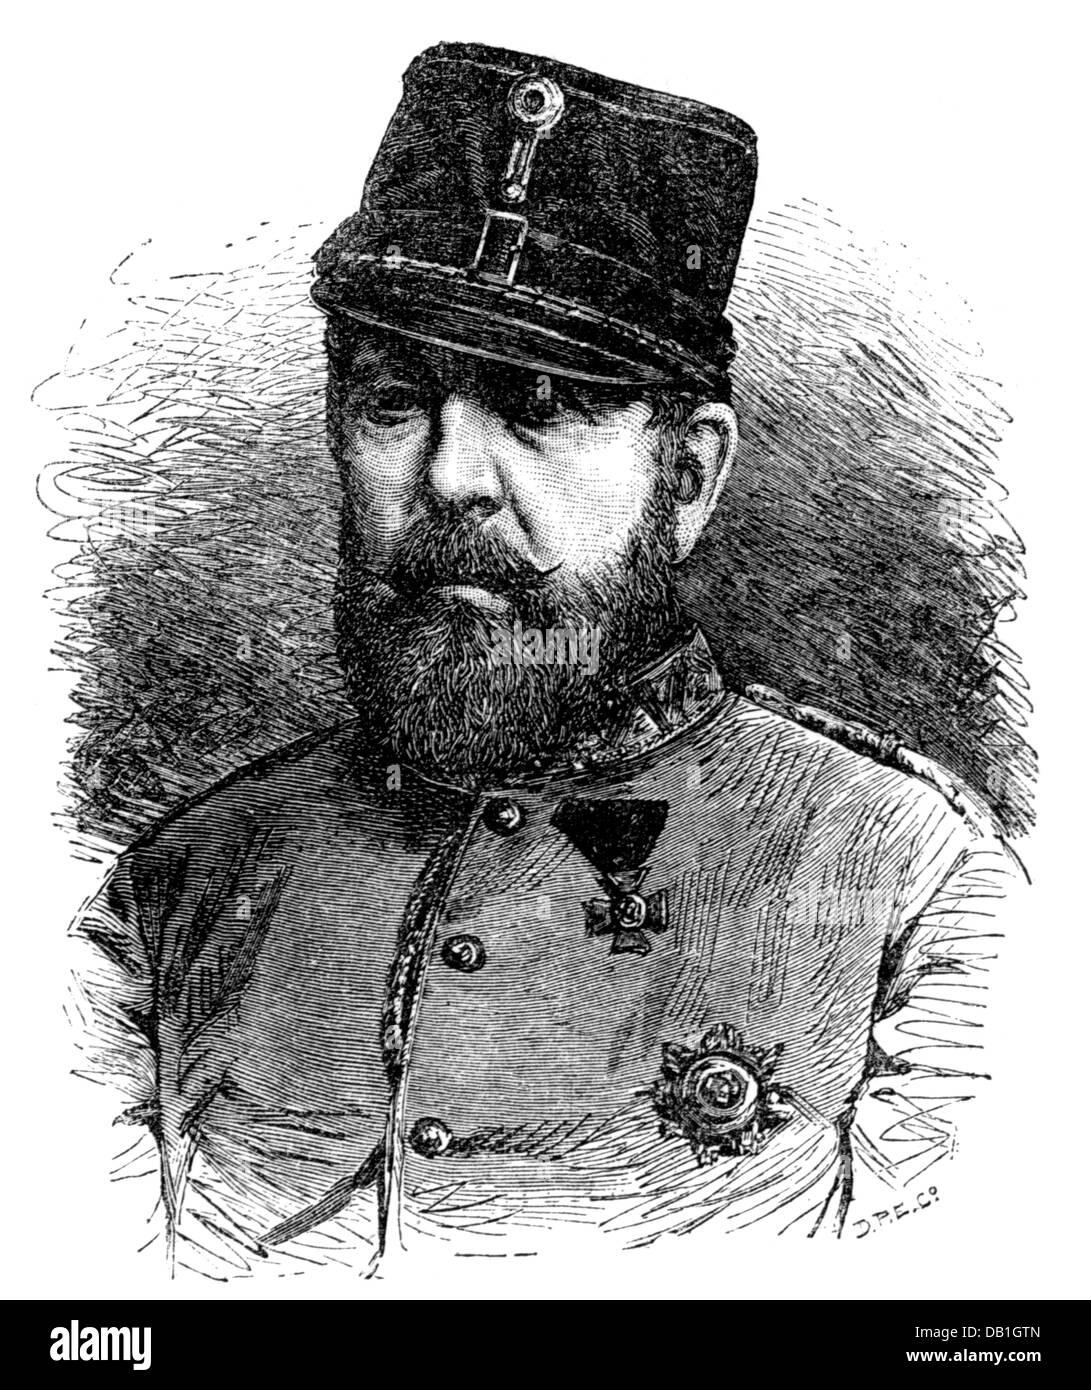 William, 25.4.1806 - 18.10.1884, Duke of Brunswick 20.4.1831 - 18.10.1884, portrait, wood engraving, circa 1880, - Stock Image